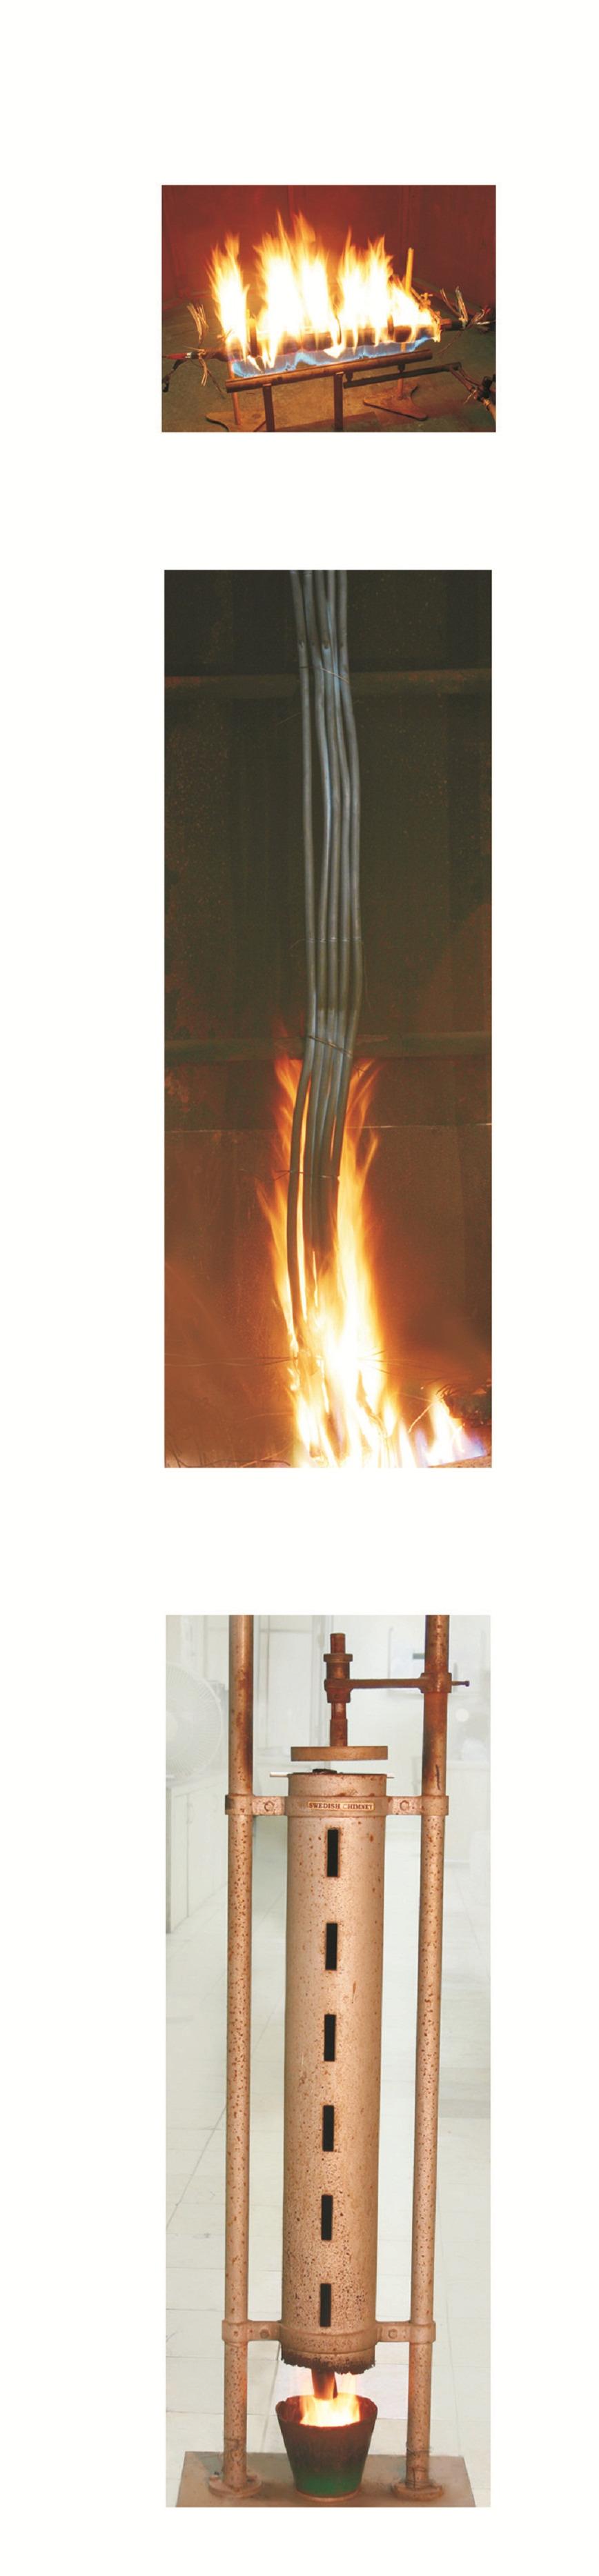 Logo Fire Resistant Cables